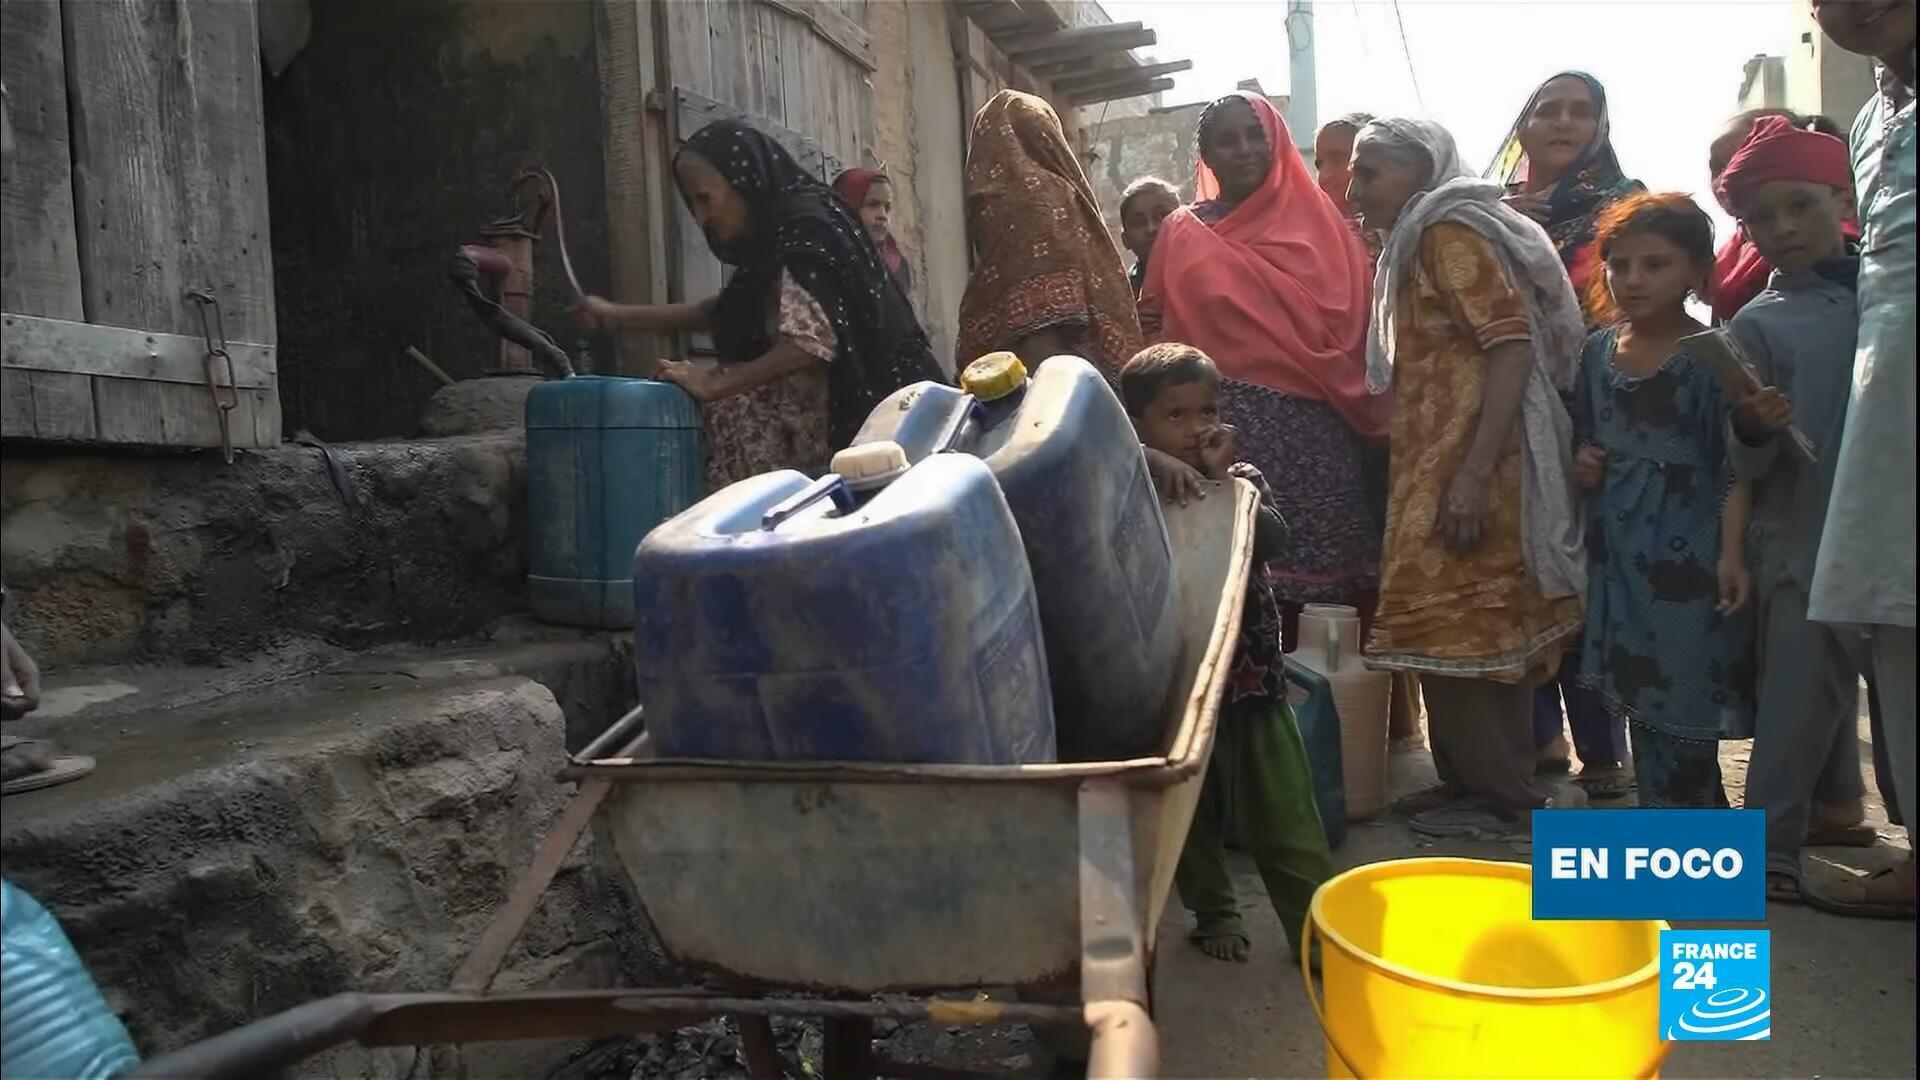 en foco - Karachi mafia del agua